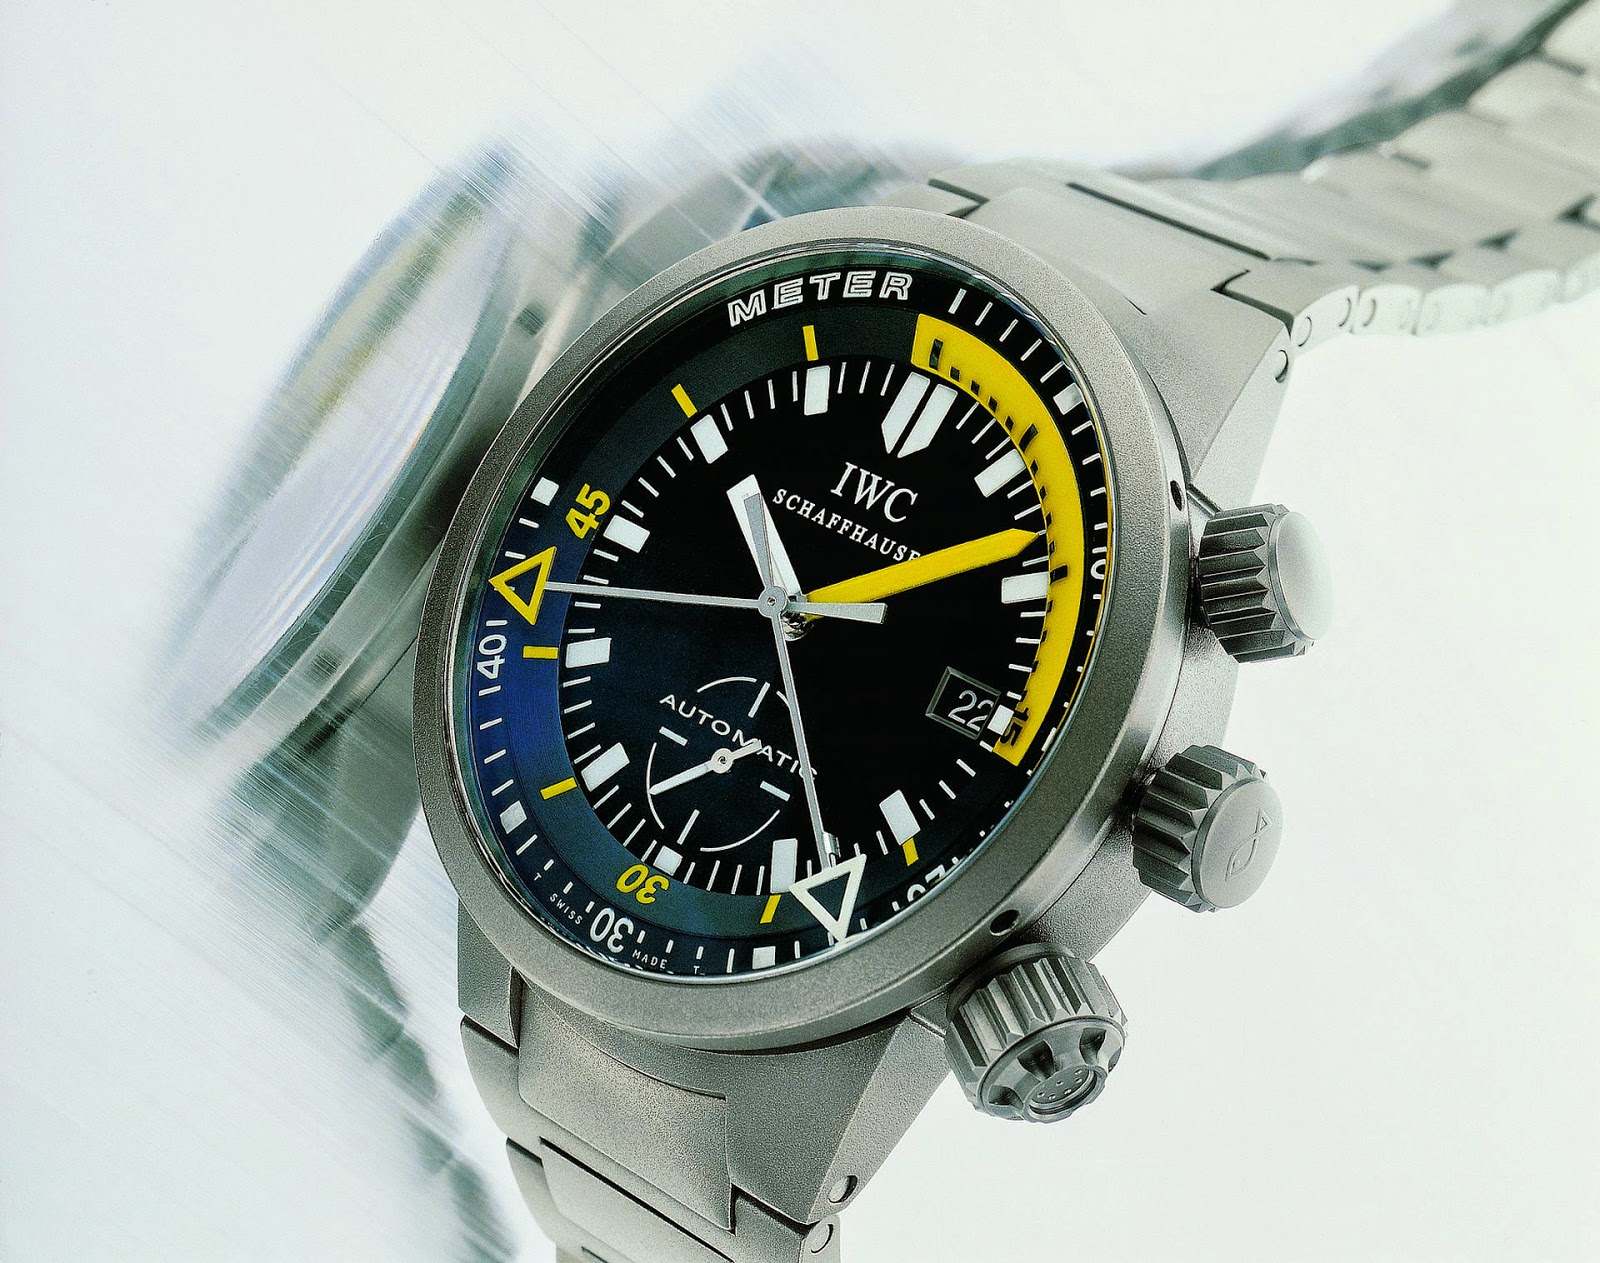 IWC Schaffhausen GST Deep One Diving Watch (1999)